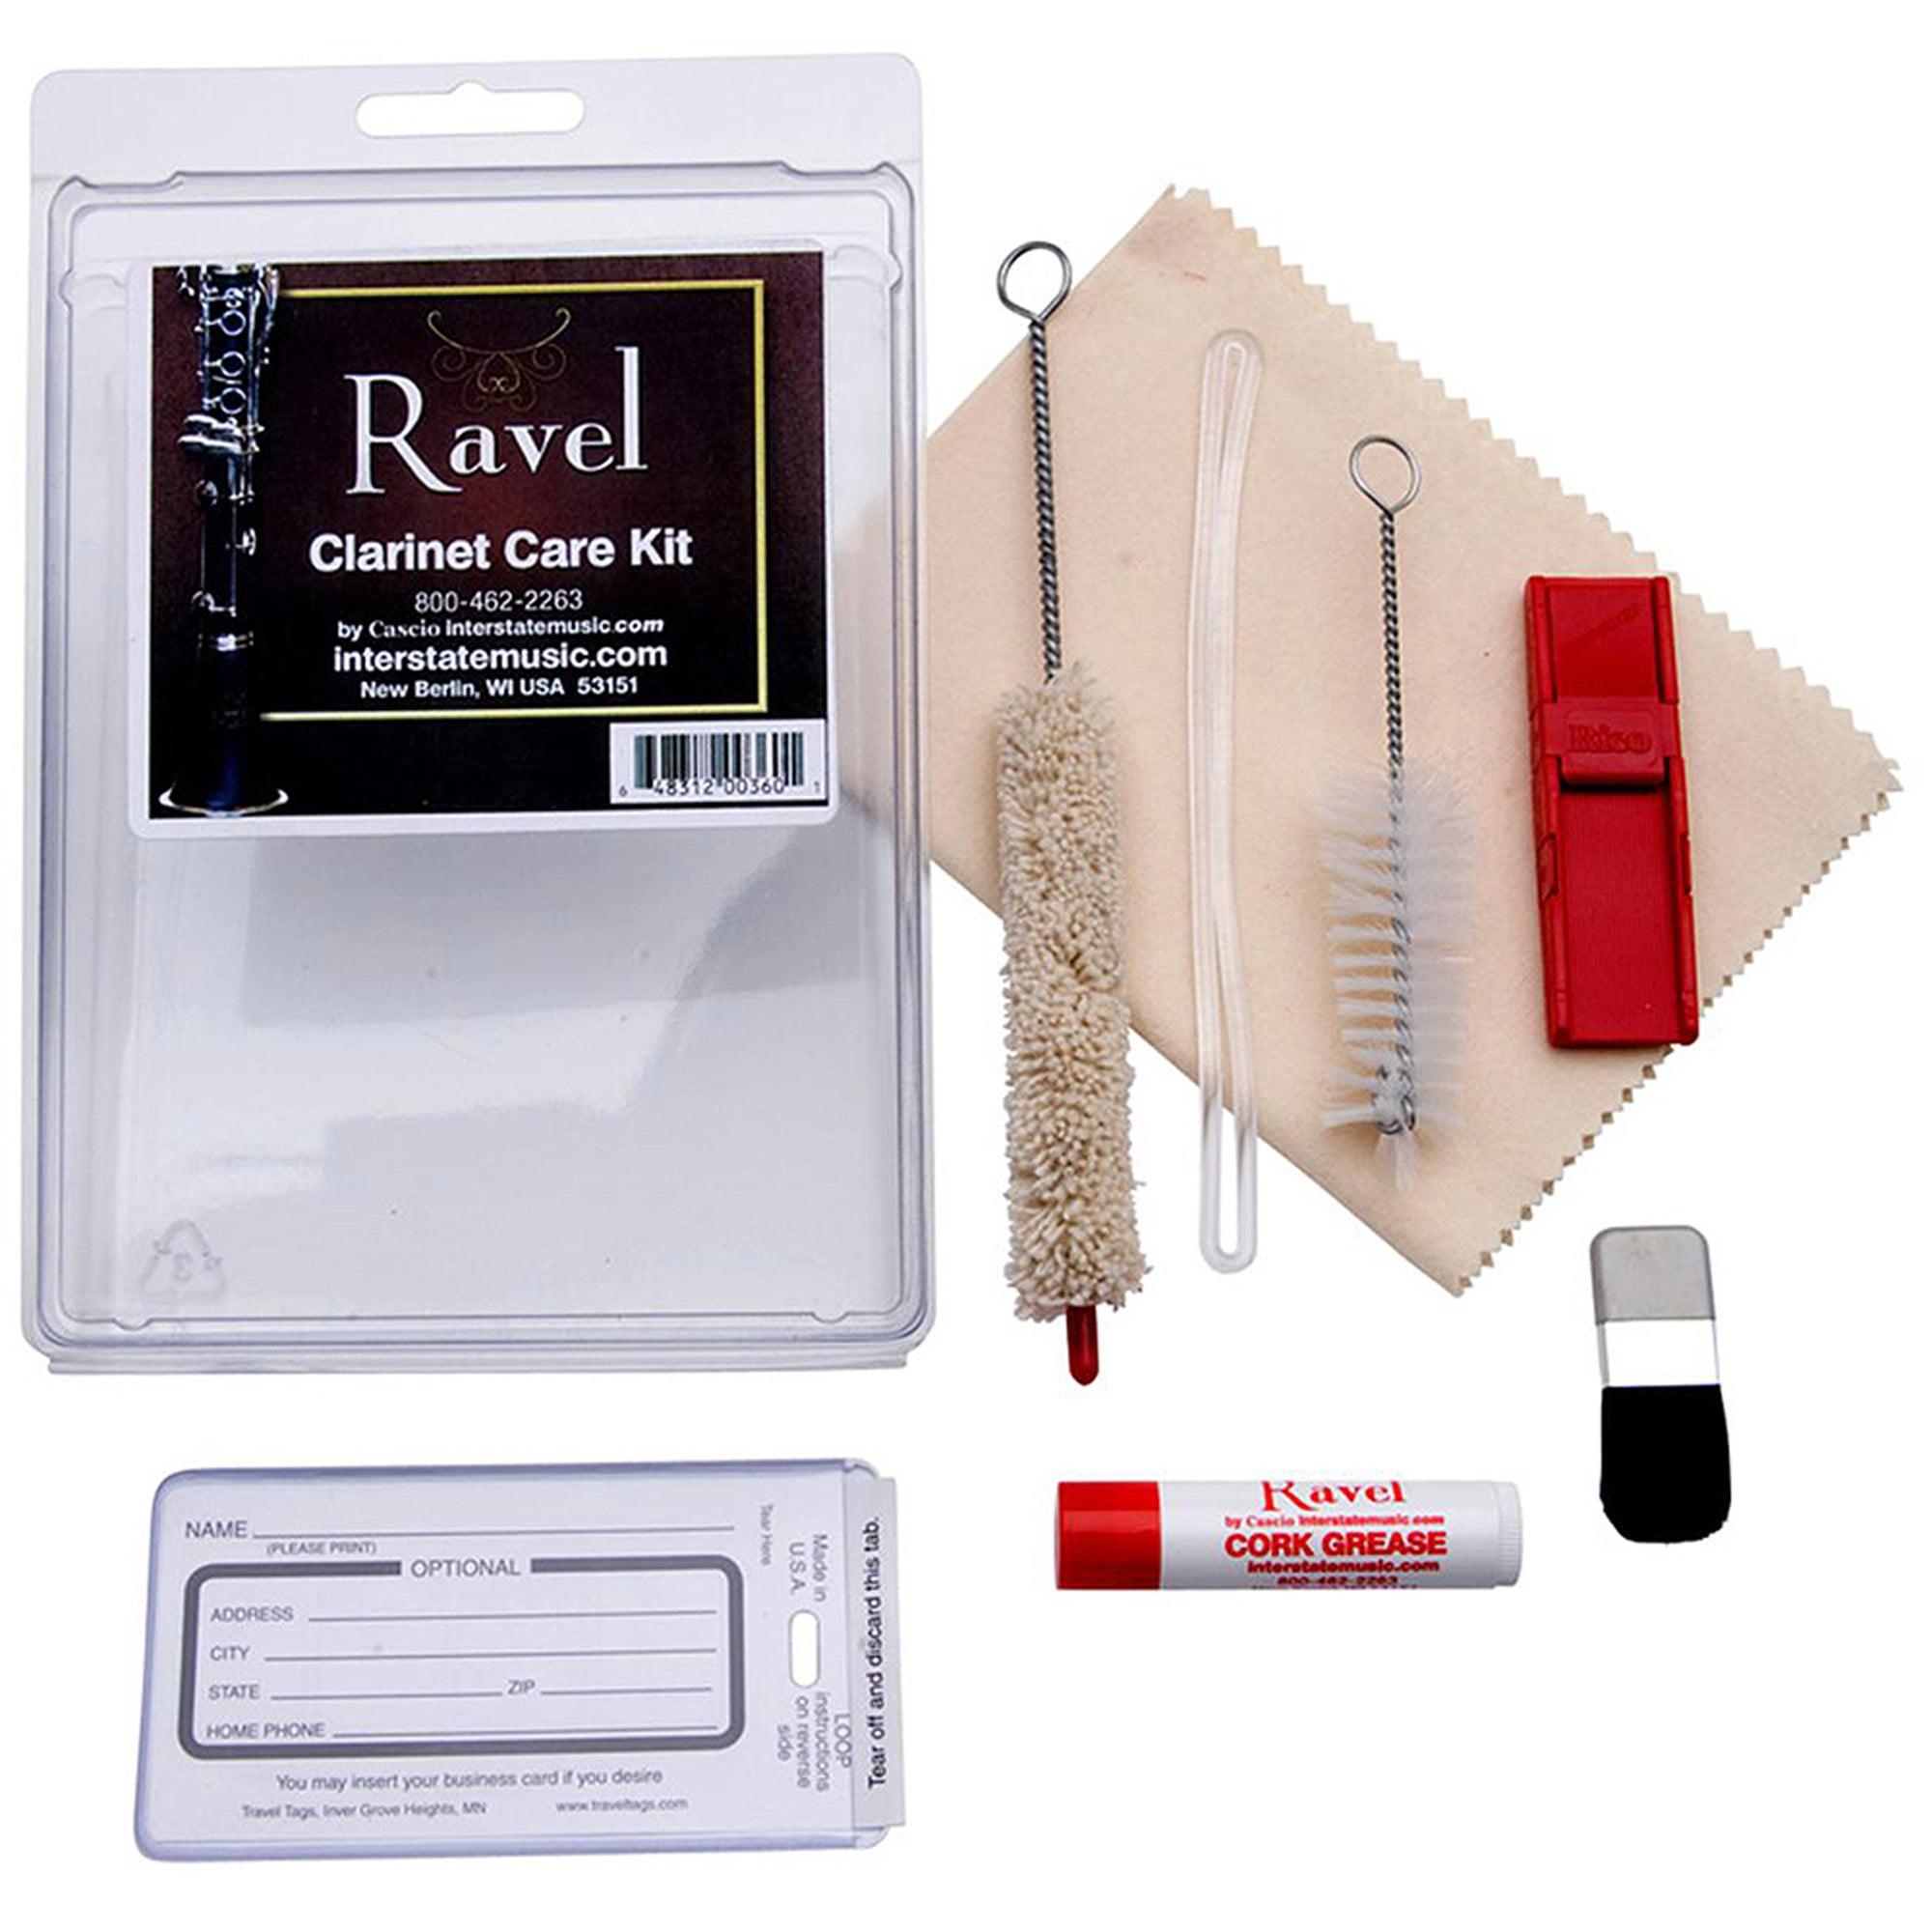 Ravel OP340, Clarinet Care Kit by Ravel